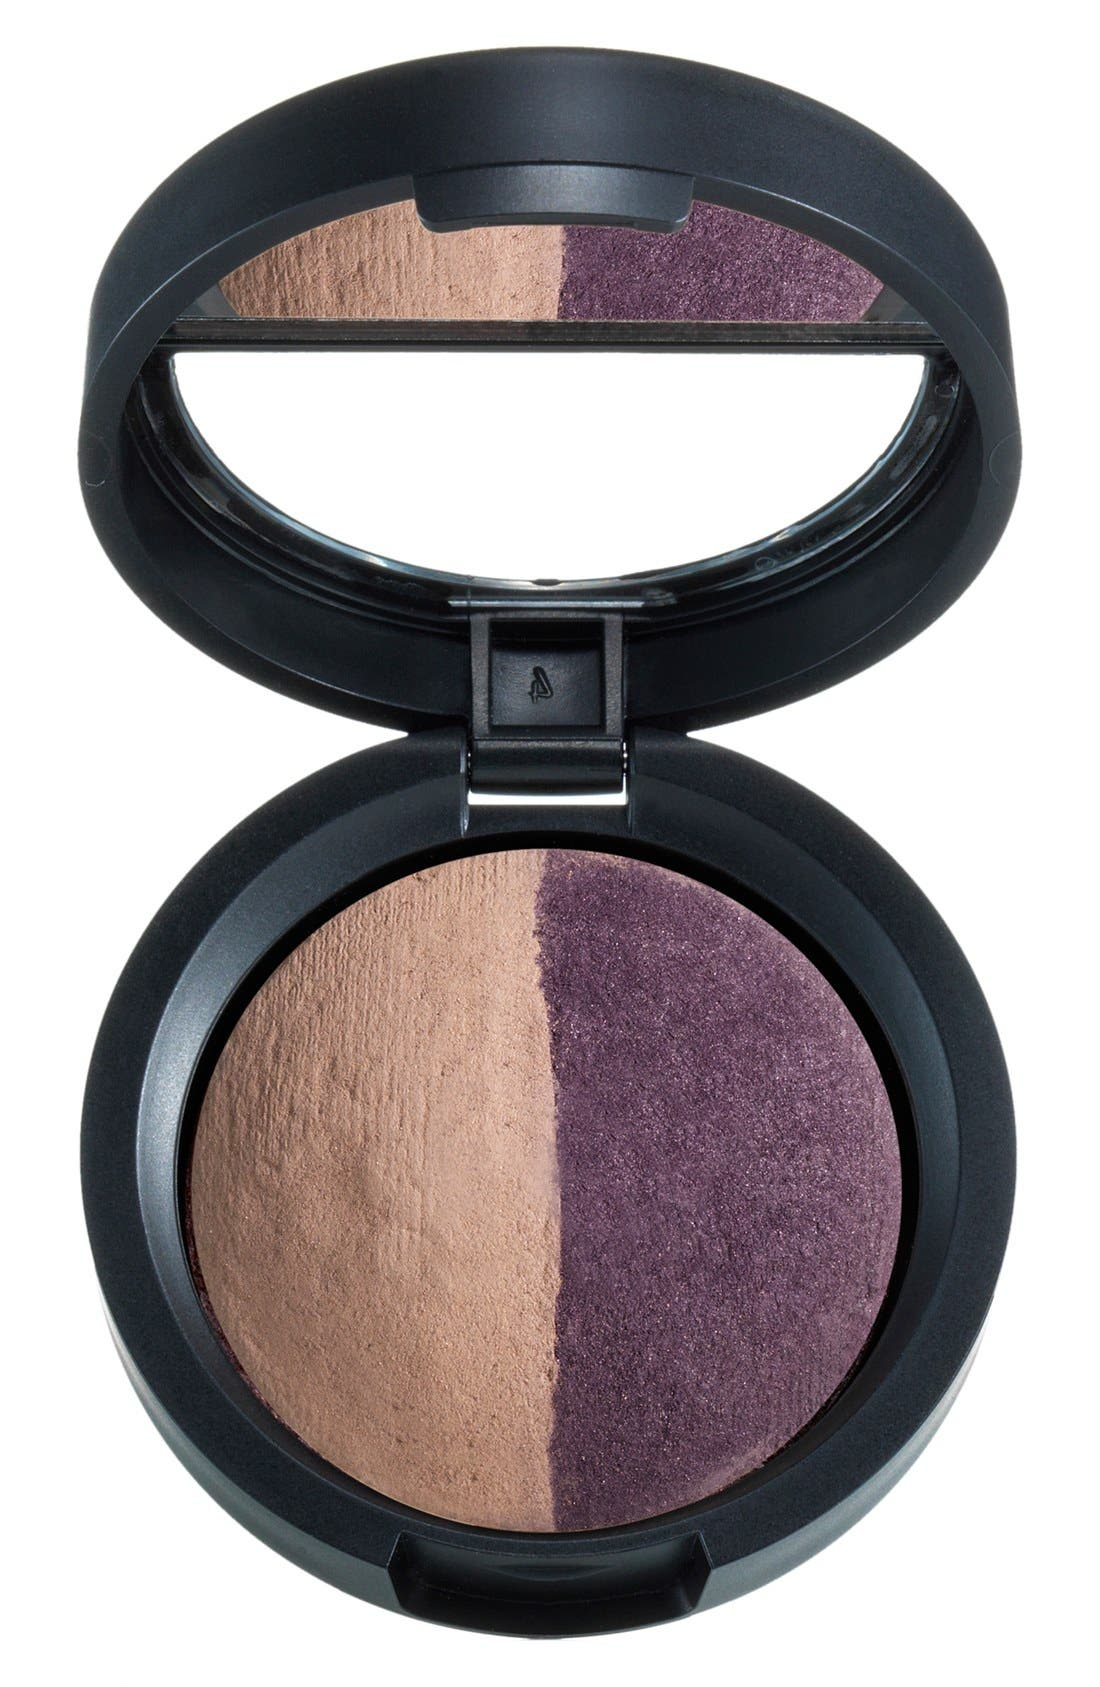 Baked Color Intense Eyeshadow Duo,                             Main thumbnail 4, color,